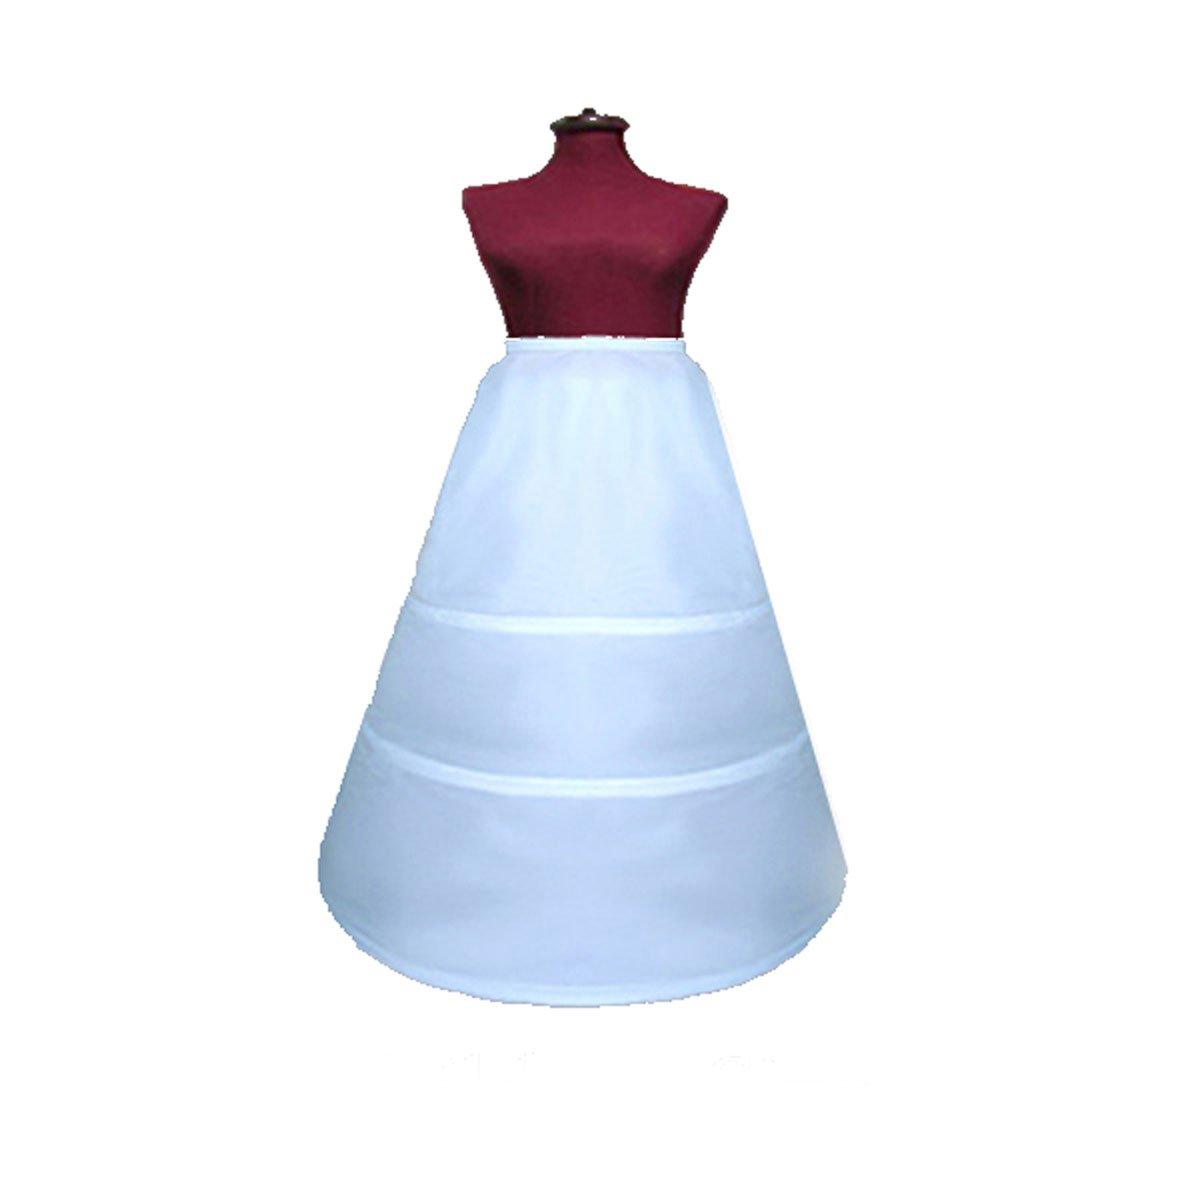 SACASUSA (TM) 3-HOOP Flower Girl Petticoat Skirt Slip S M L XL waist size up to 36